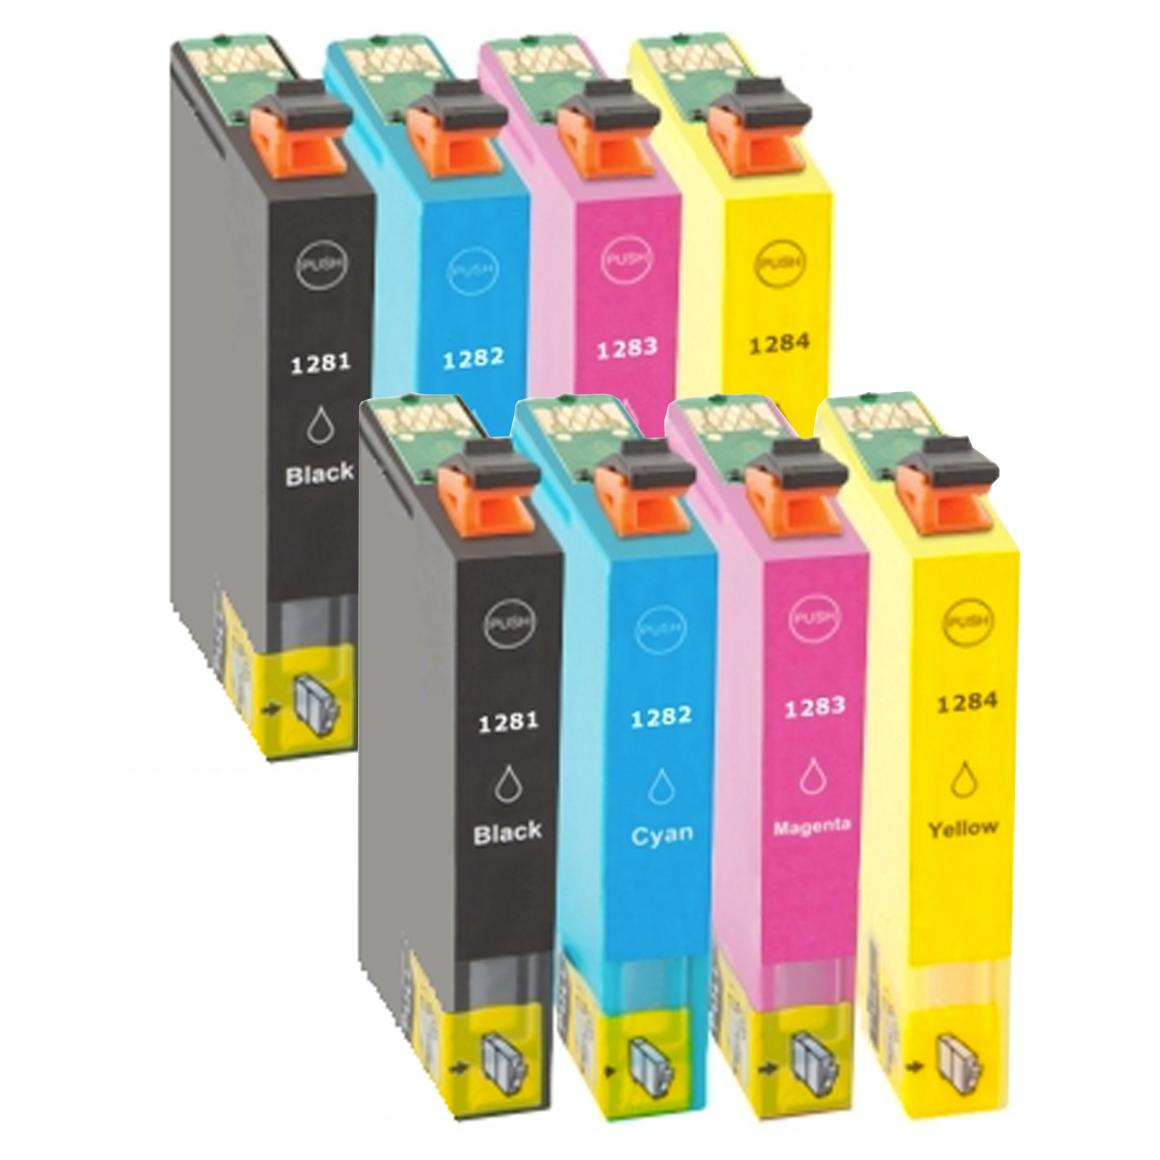 Afbeelding van 2x Epson T1285 multipack (huismerk inktcartridges)